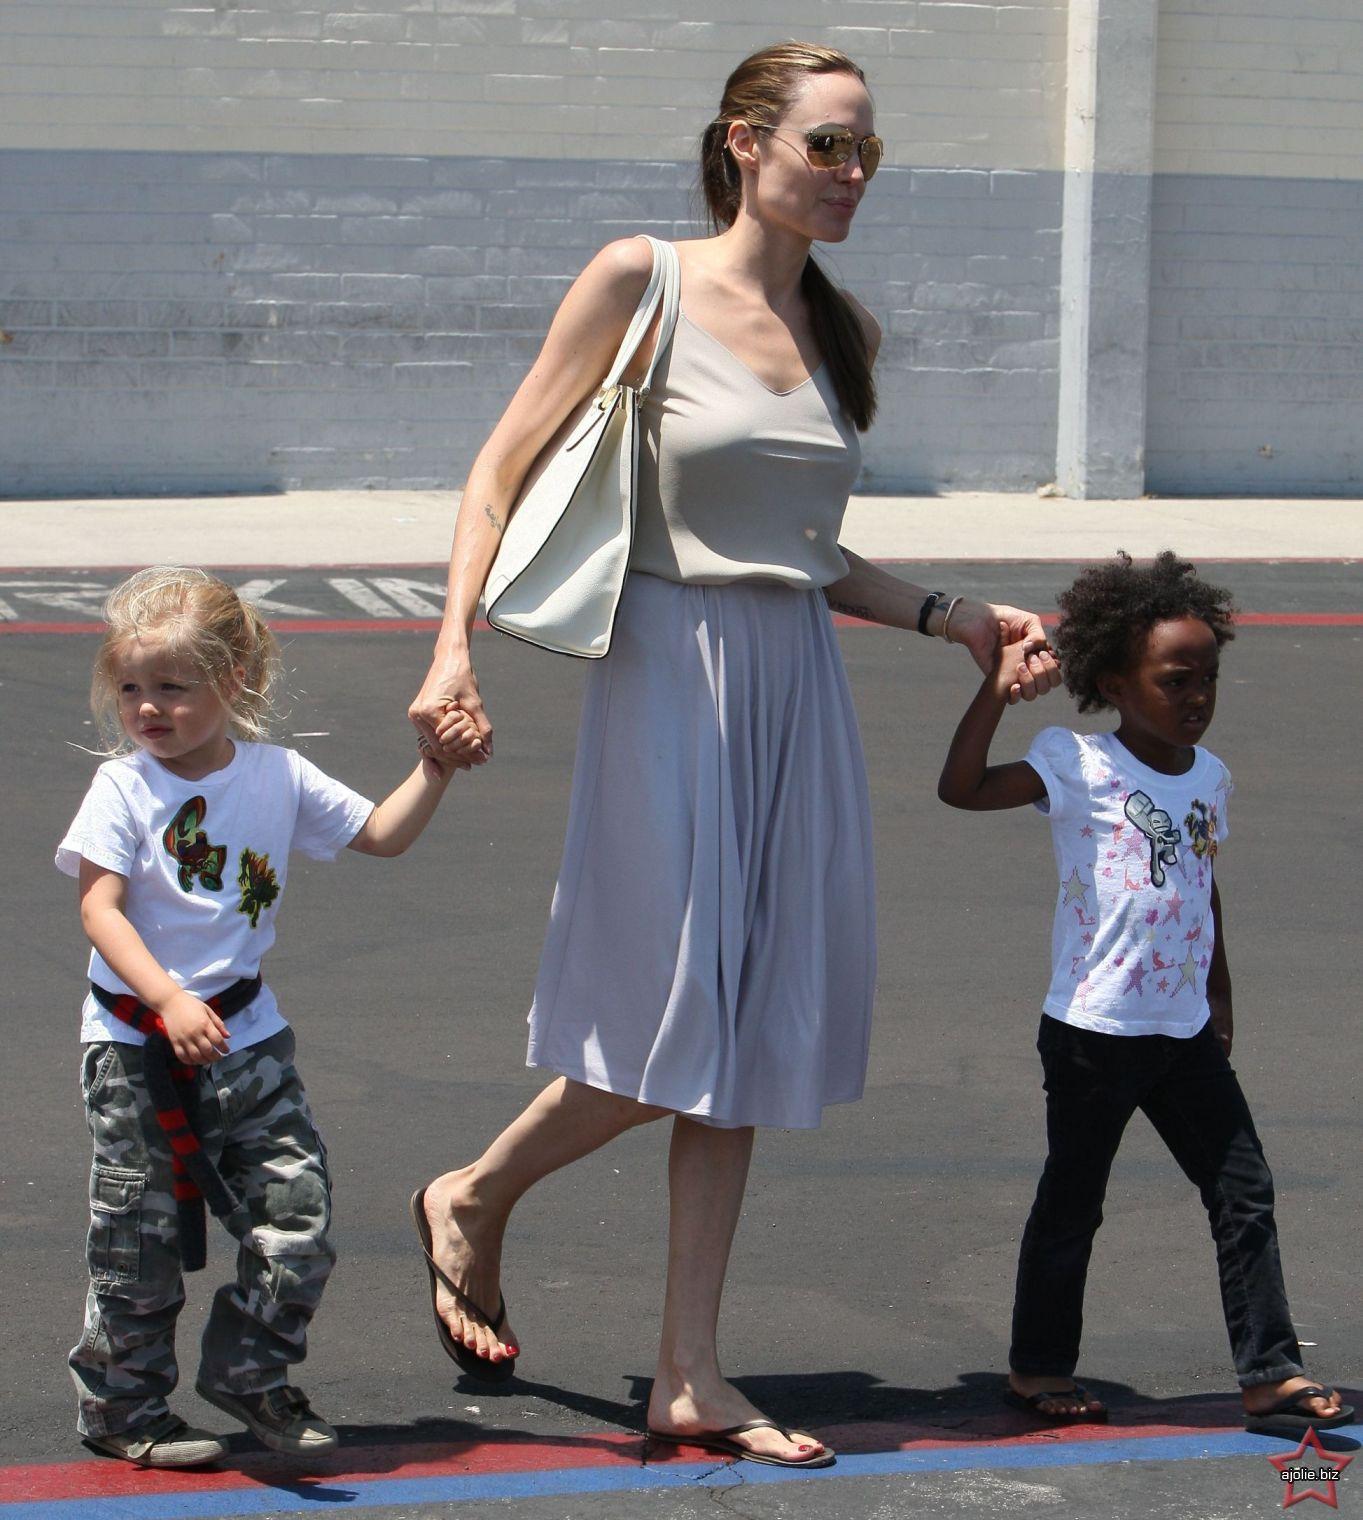 Shiloh Nouvel Jolie-Pitt photo 16 of 47 pics, wallpaper ... Angelina Jolie News